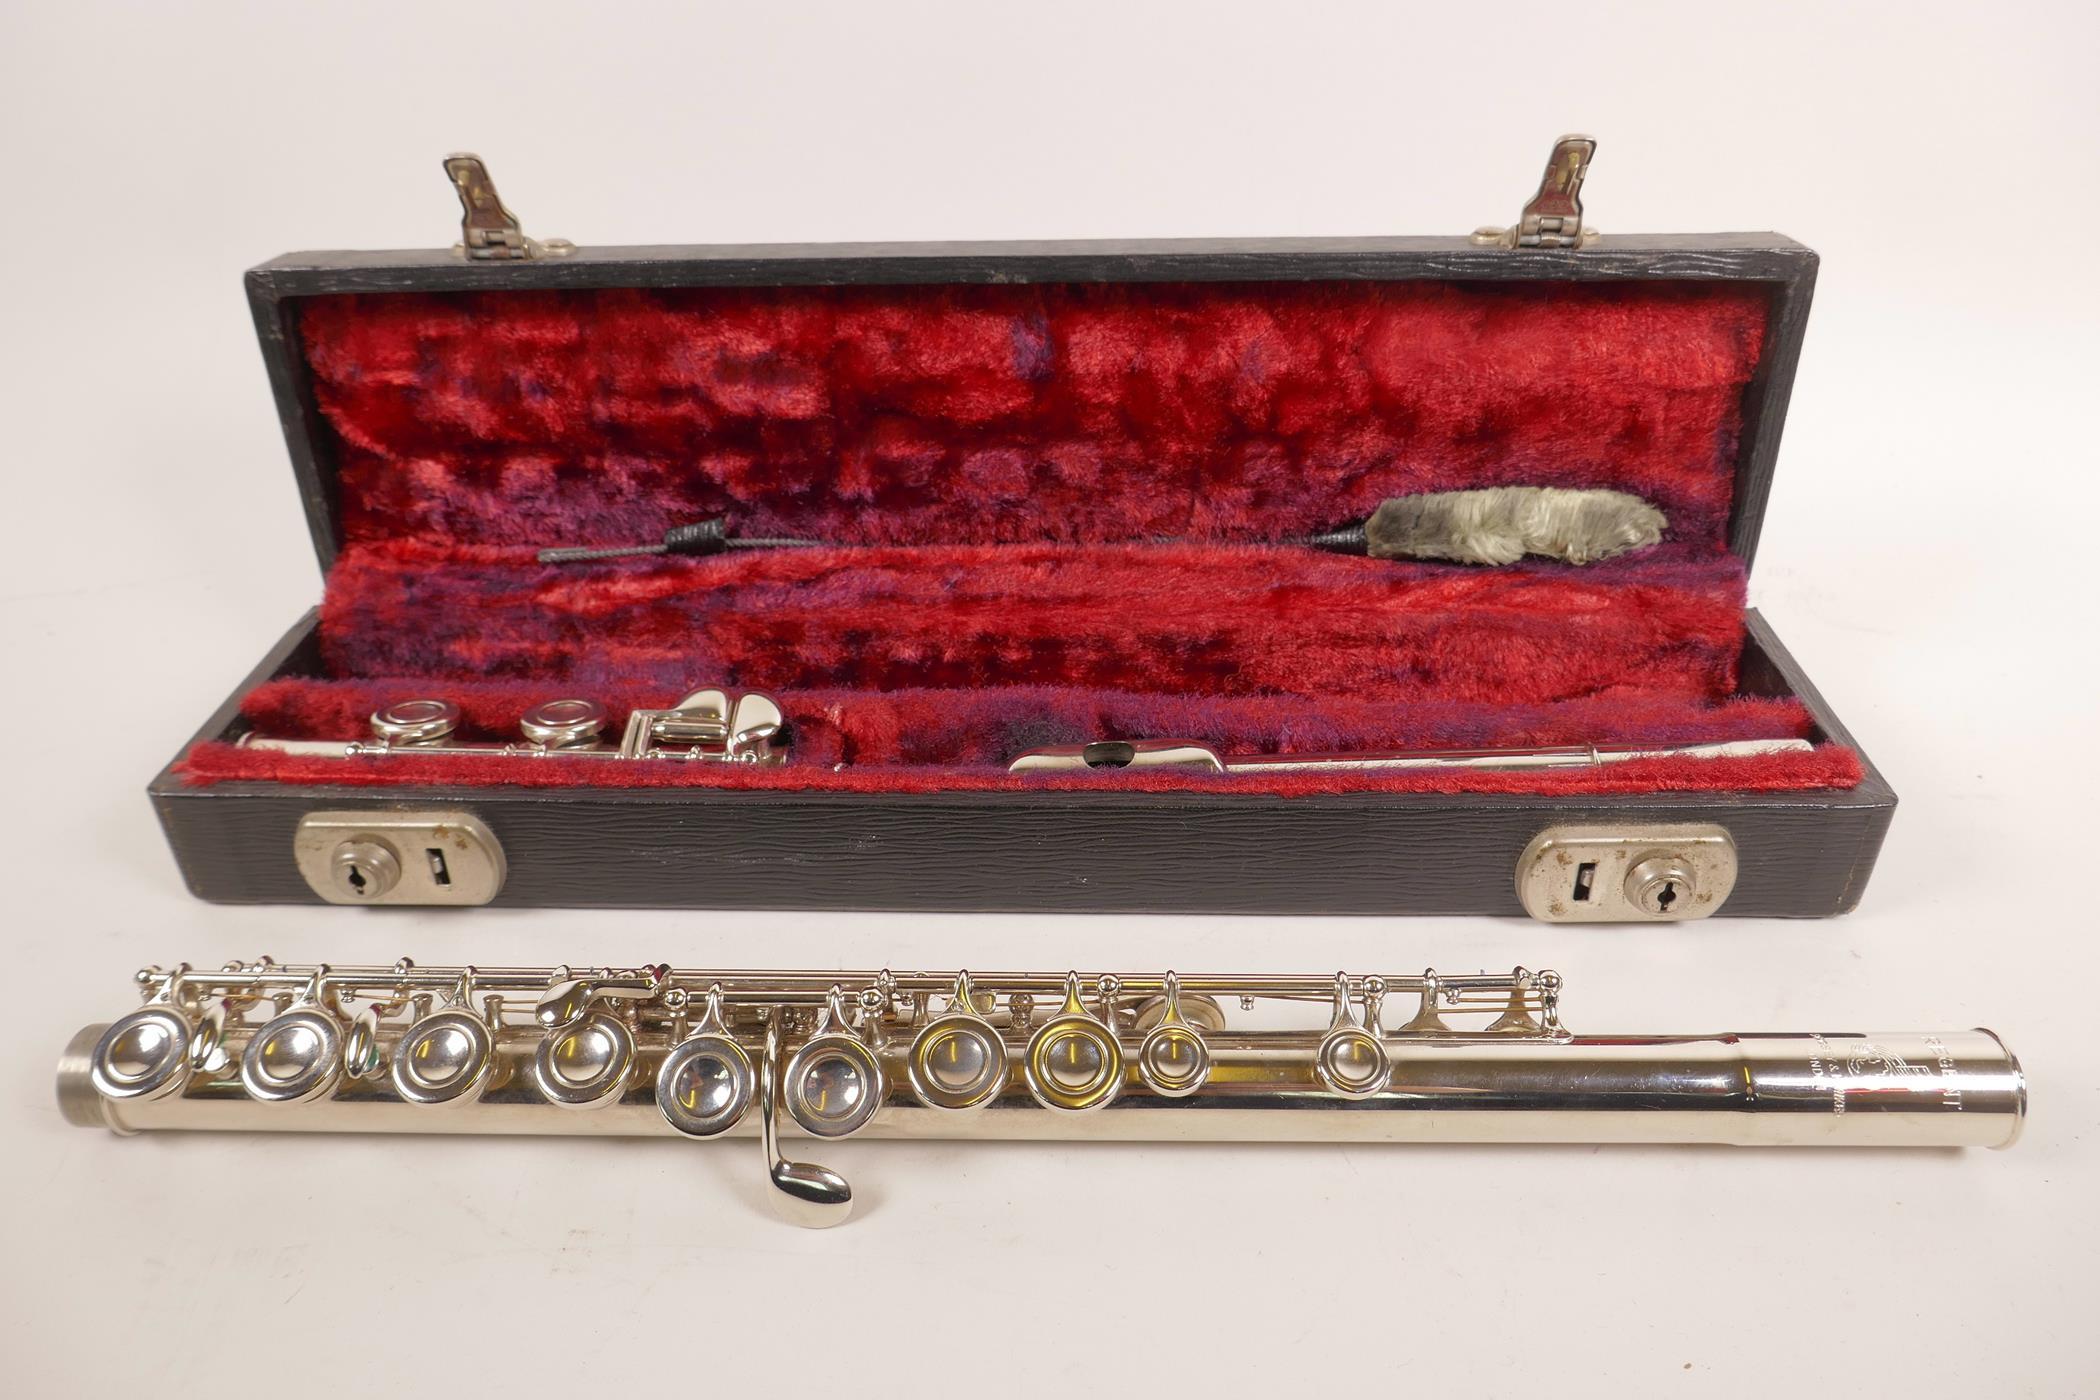 Lot 27 - A Boosey & Hawkes 'Regent' flute, serial number 343931, in original case